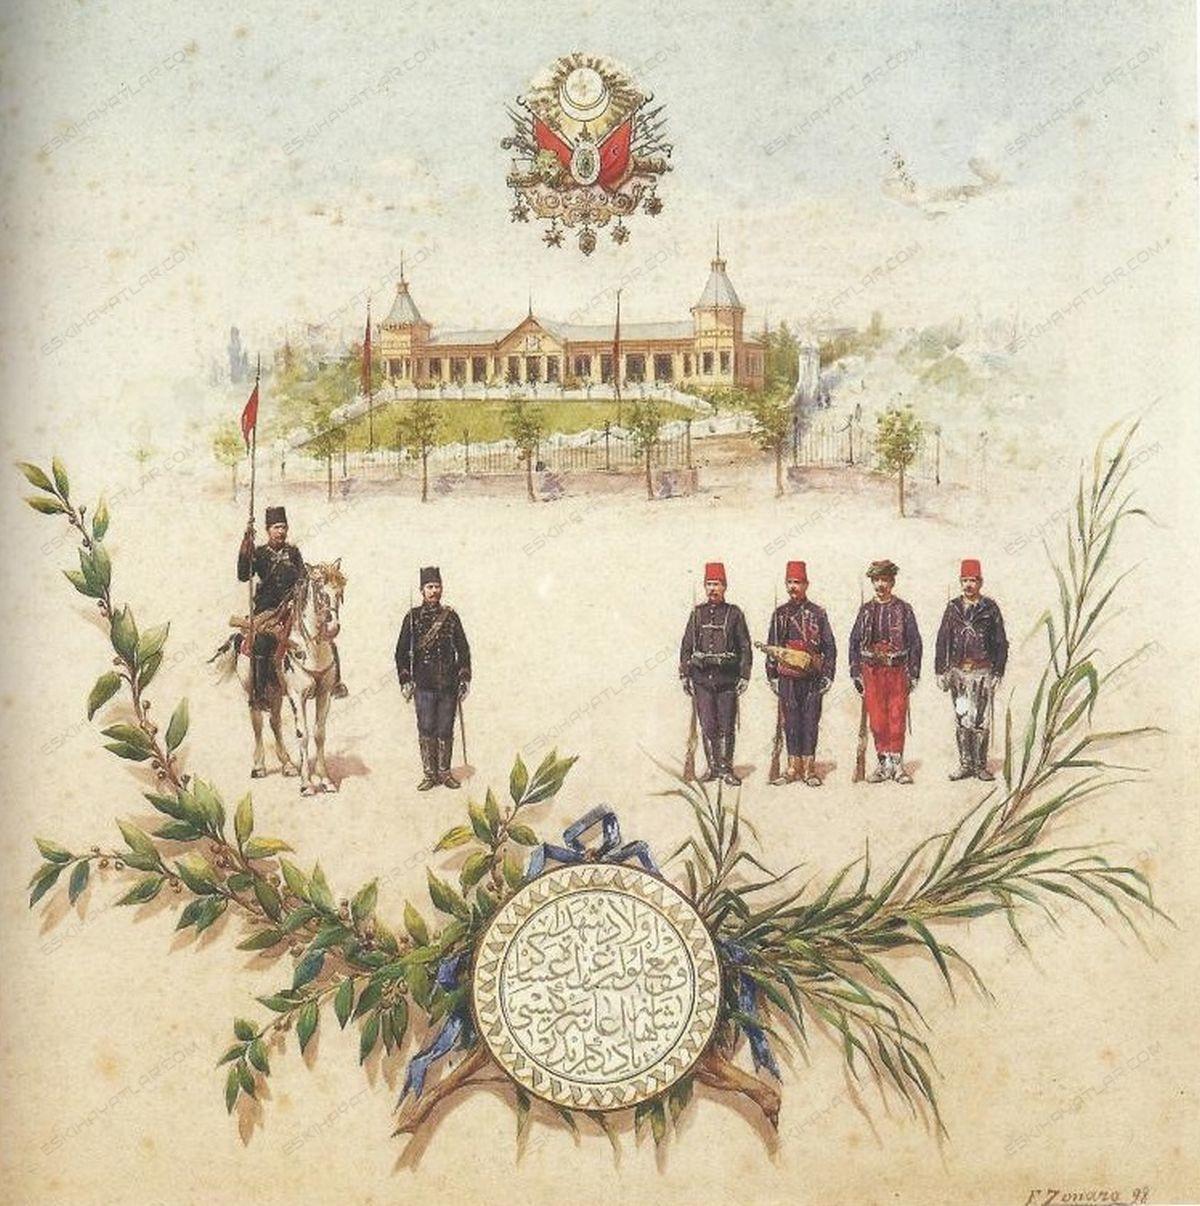 0354-fausto-zonaro-evladi-suheda-1893-asakiri-sahane-iane-sergisi